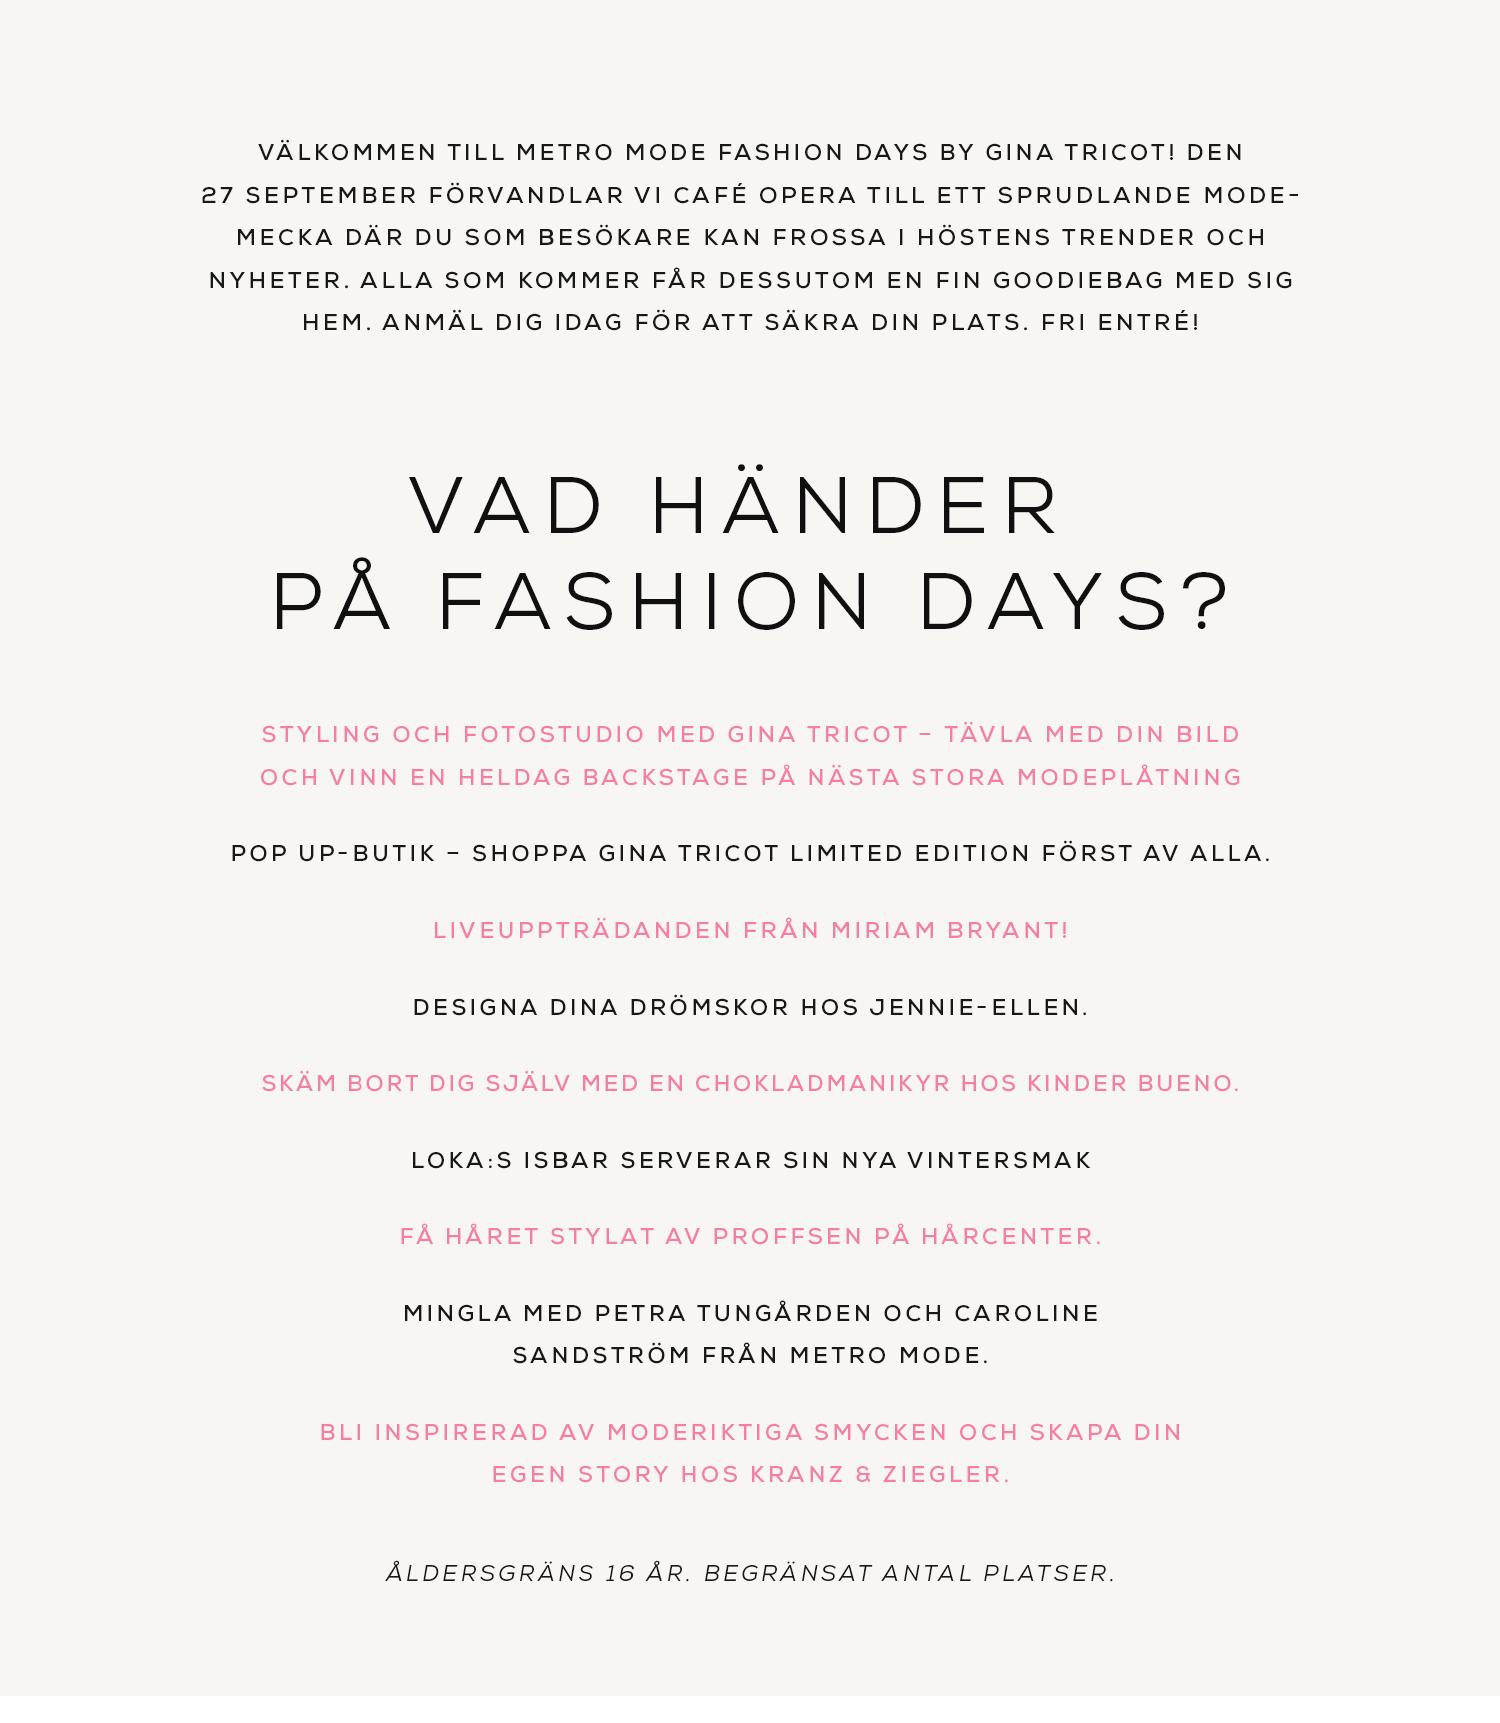 fashiondays2